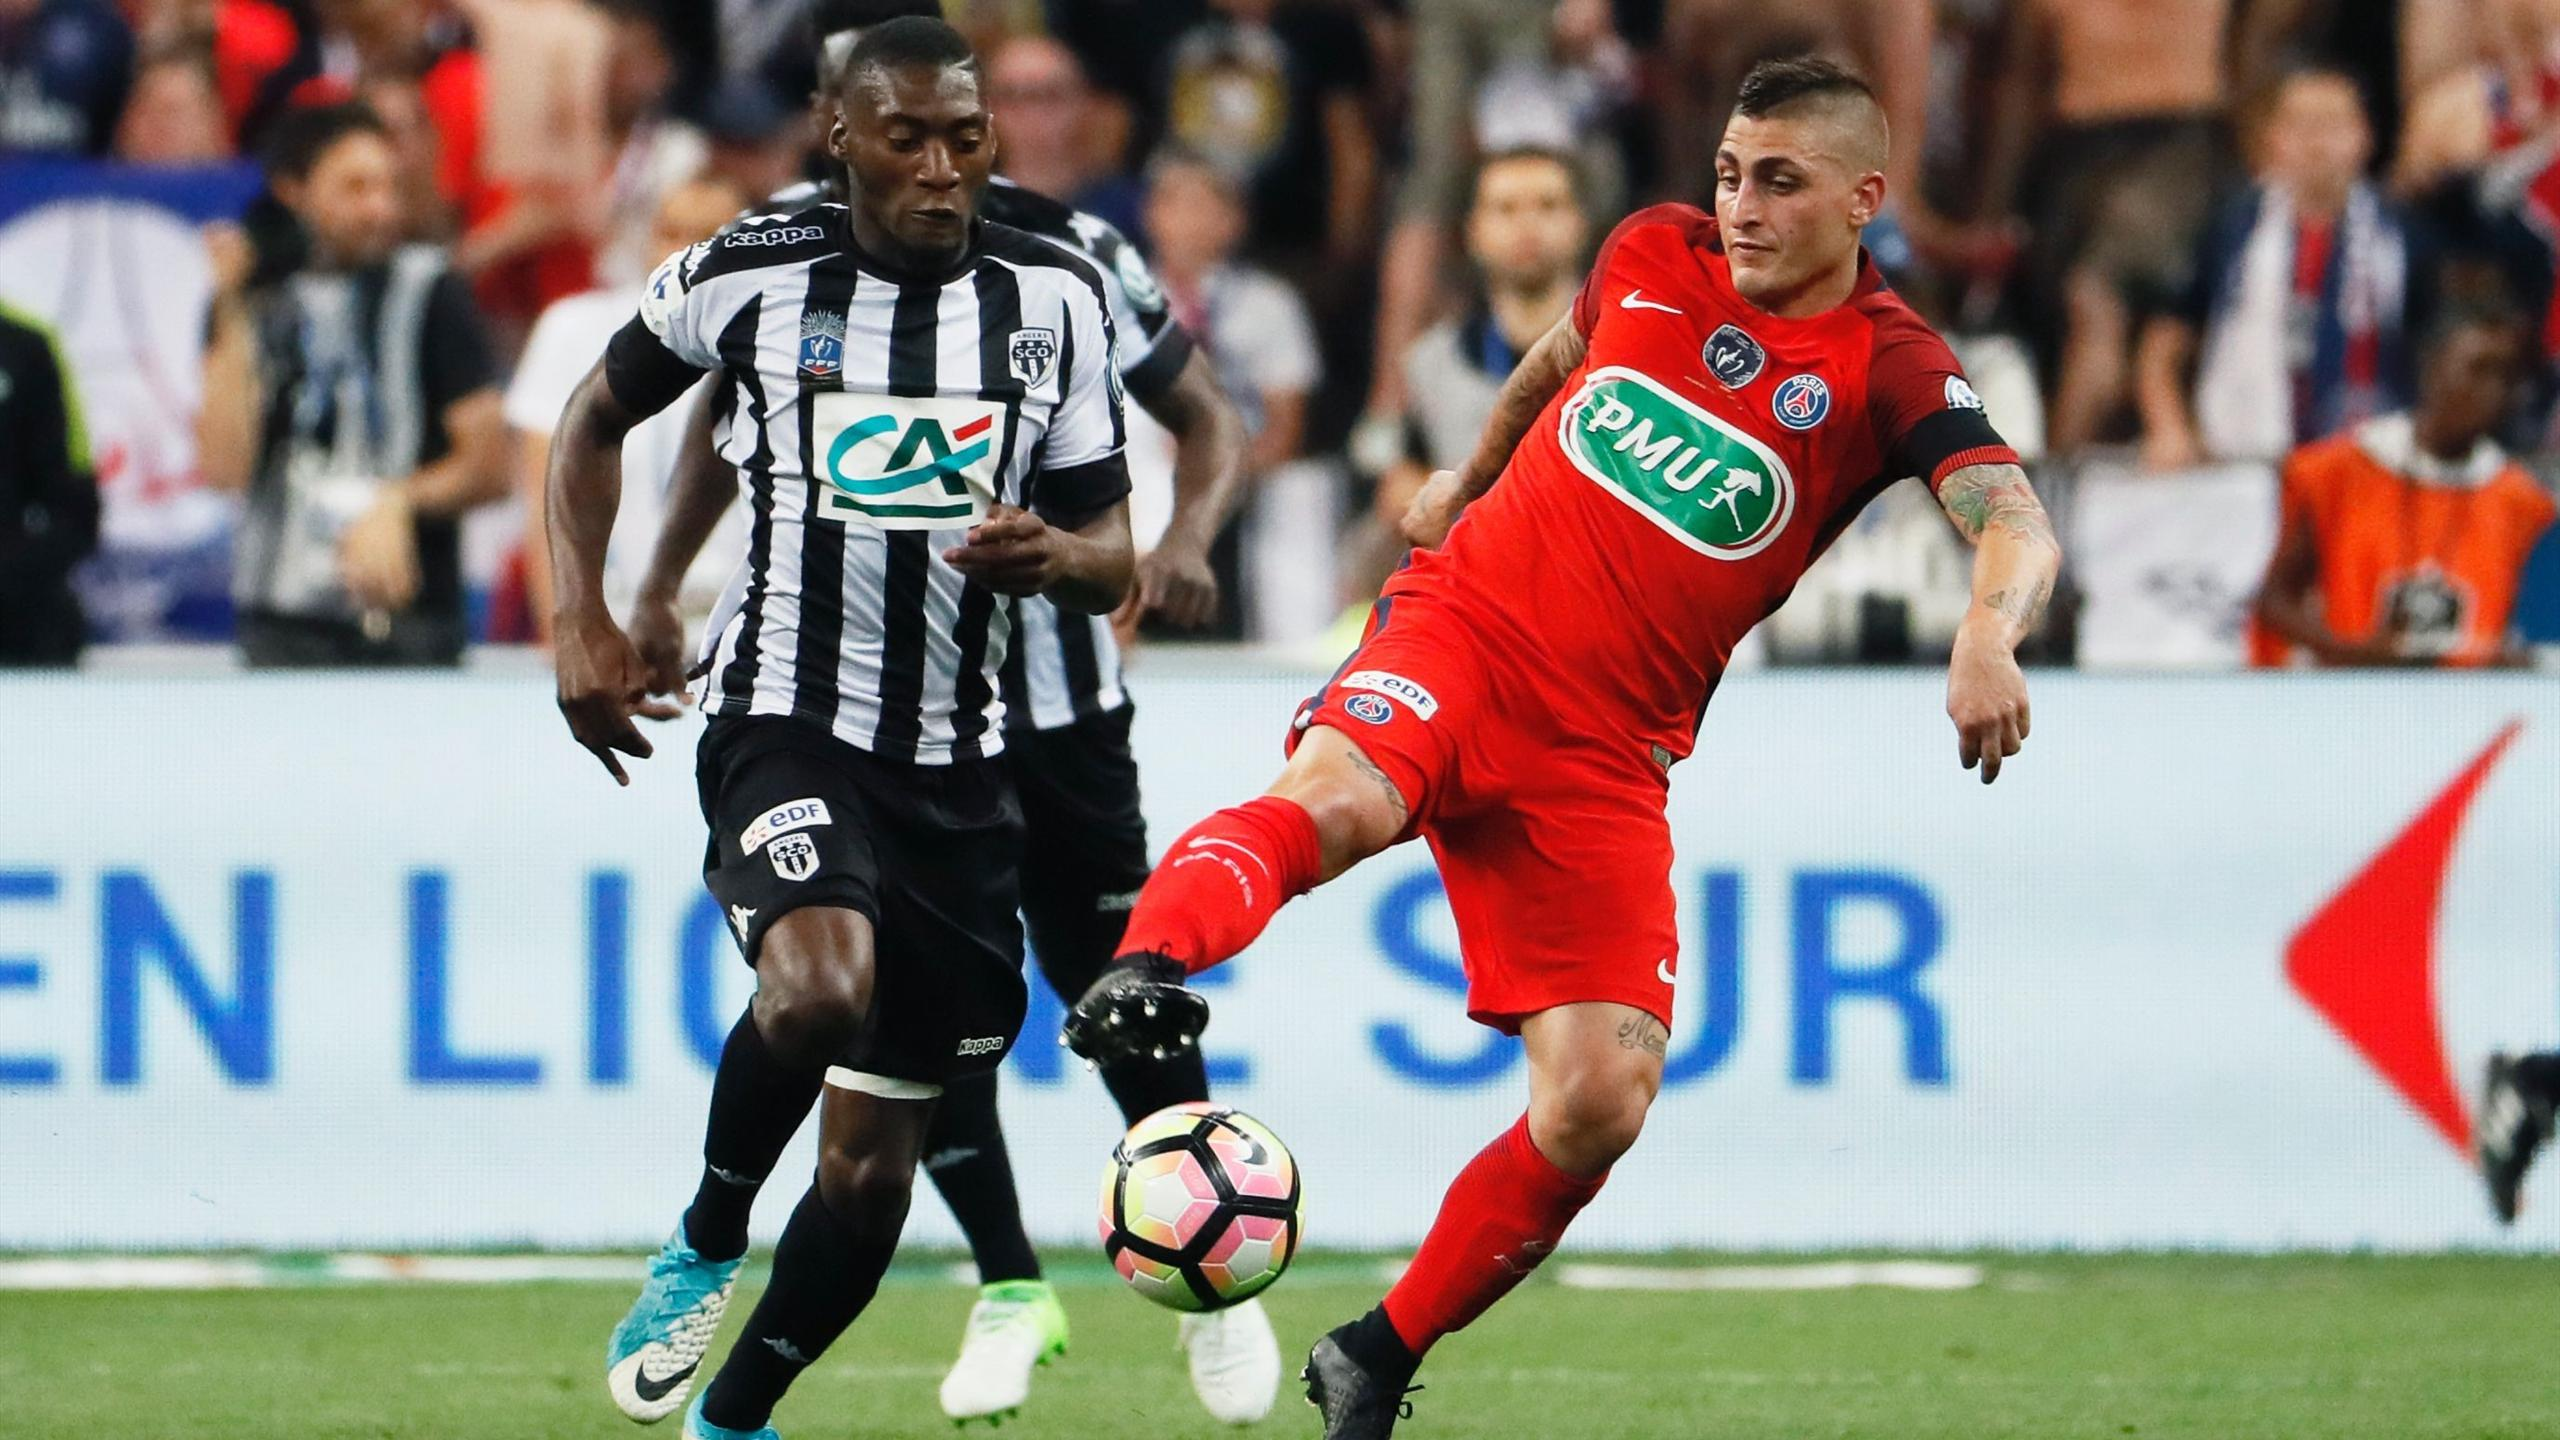 Футбол франции